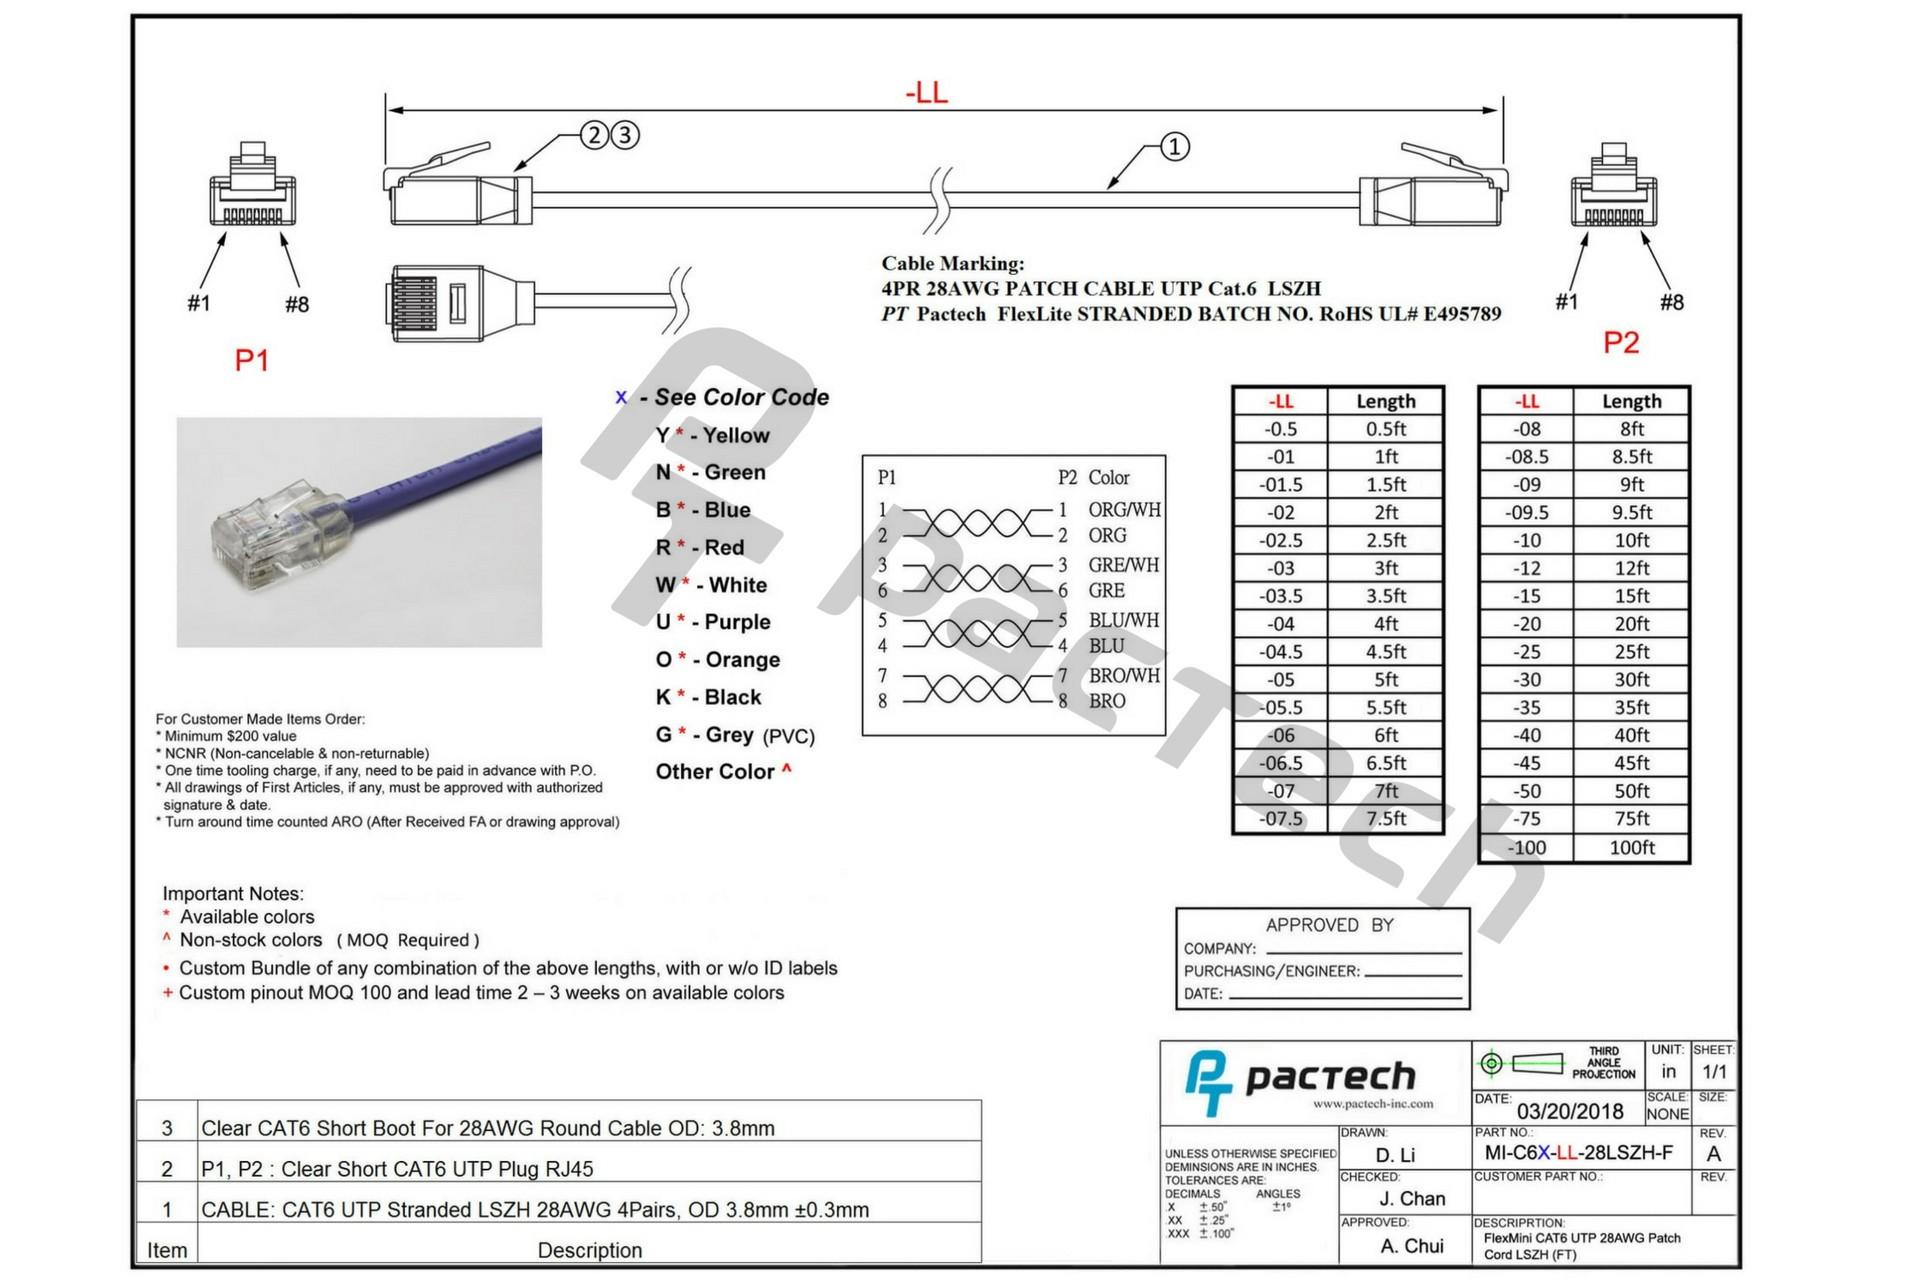 Ethernet Cable Wiring Diagram B Best Plug Wiring Diagram Australia Refrence Ethernet Cable Wiring Diagram